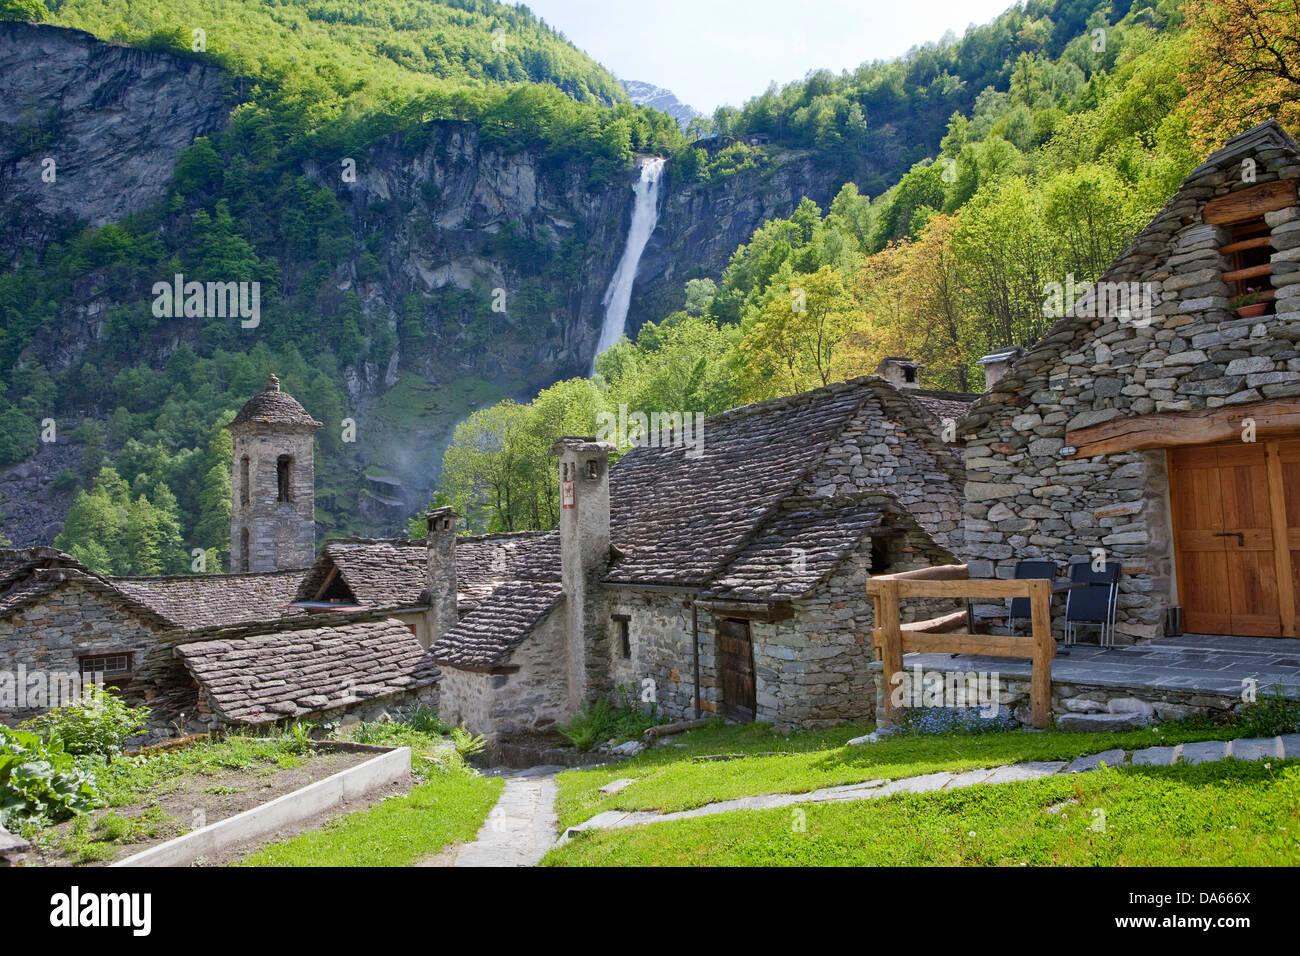 Foroglio, Bavona valley, canton, TI, Ticino, South Switzerland, village, Switzerland, Europe, stone houses - Stock Image